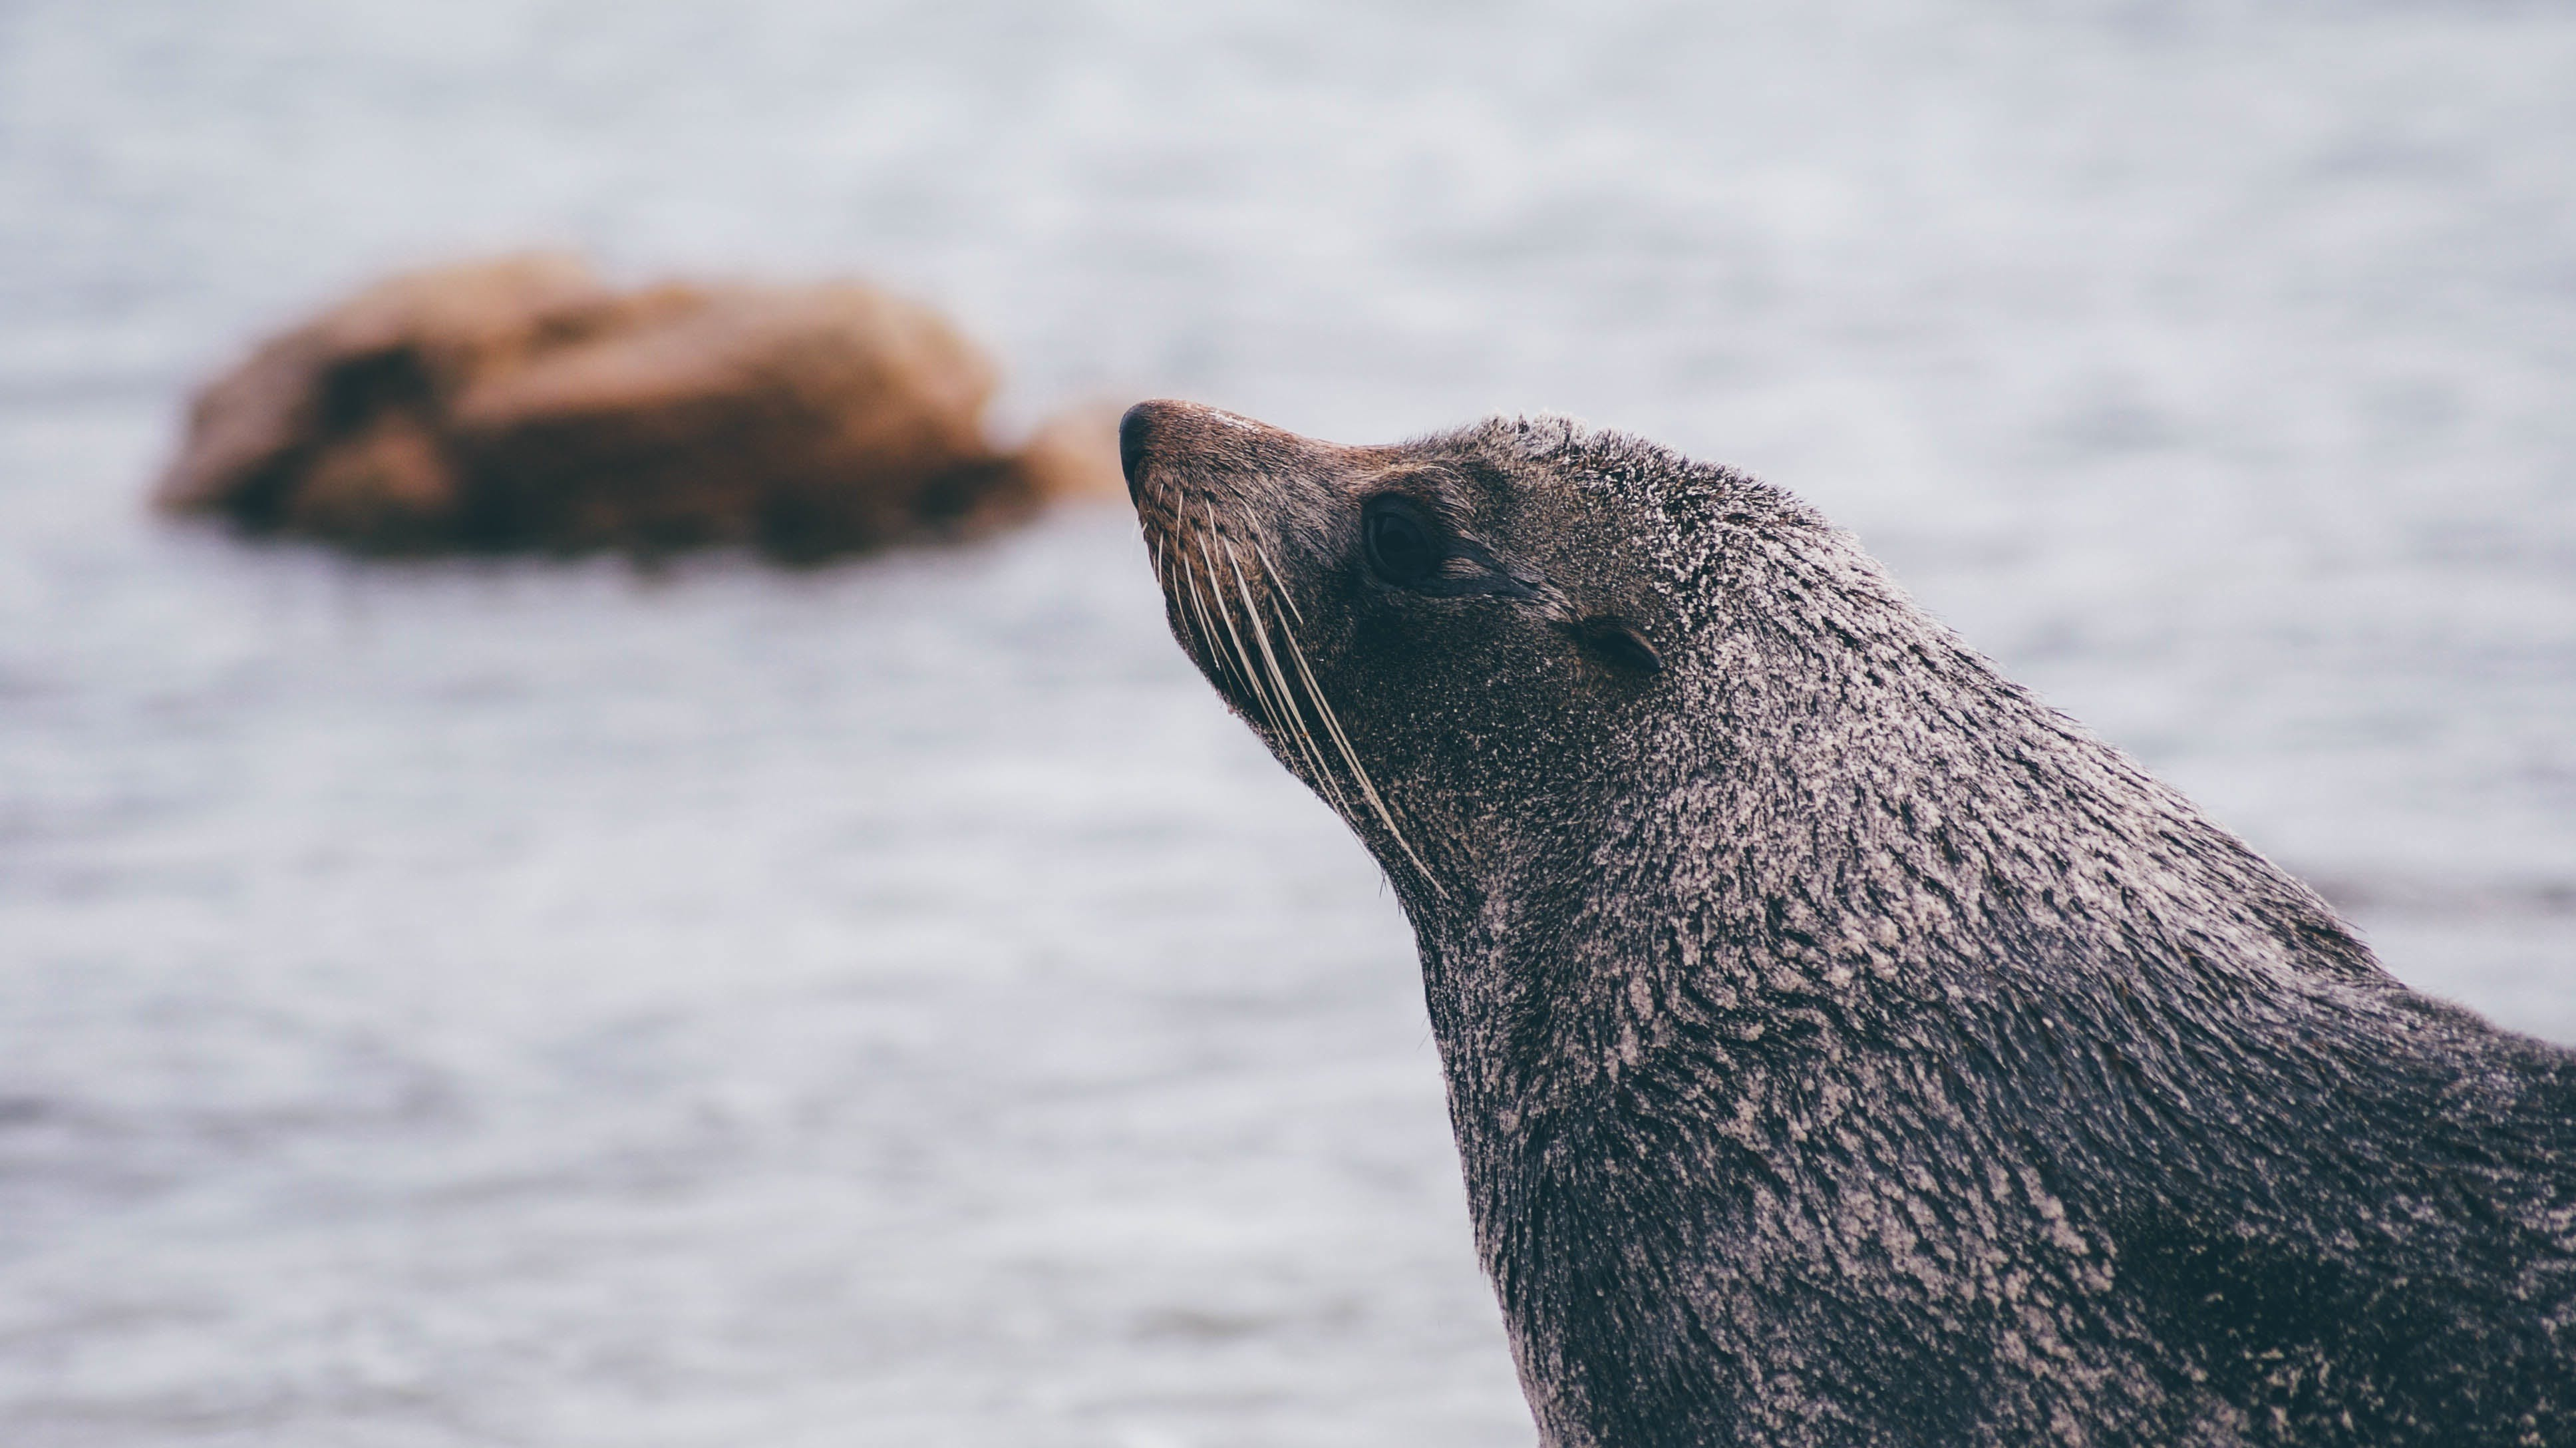 Black Seal Near Body of Water